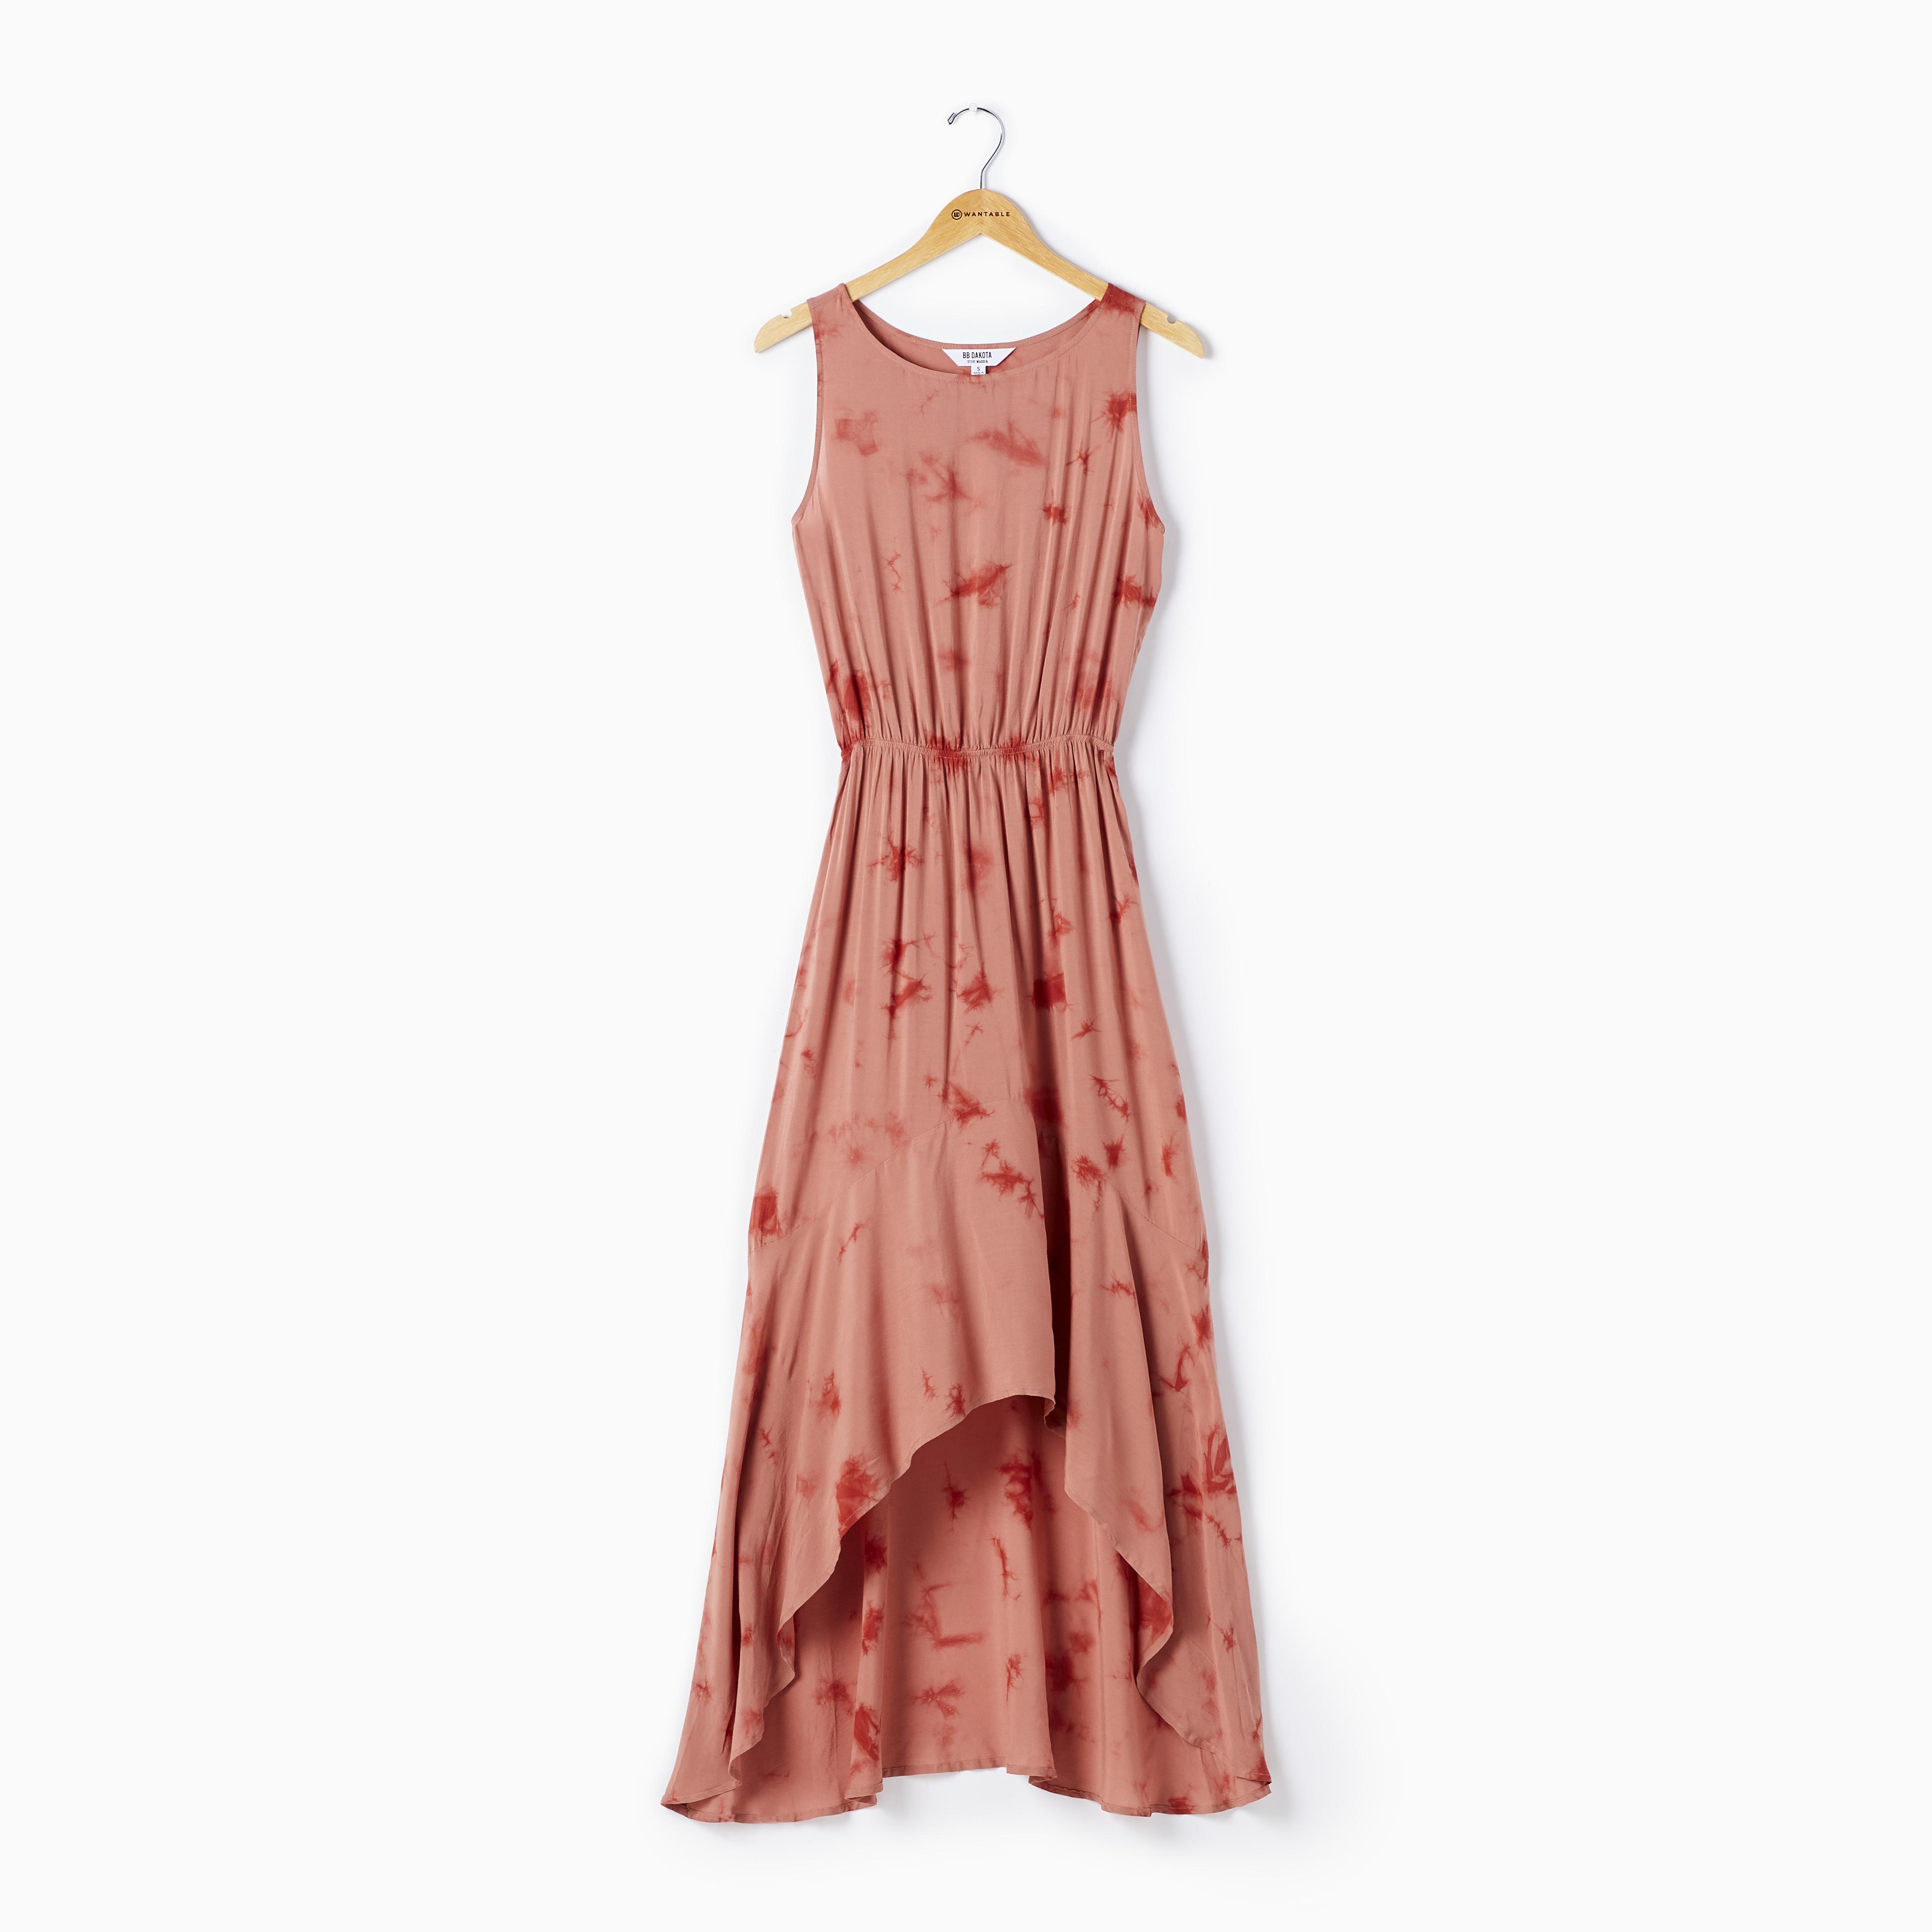 High-low tie dye maxi dress on a hanger - Casual Summer Dress by BB Dakota